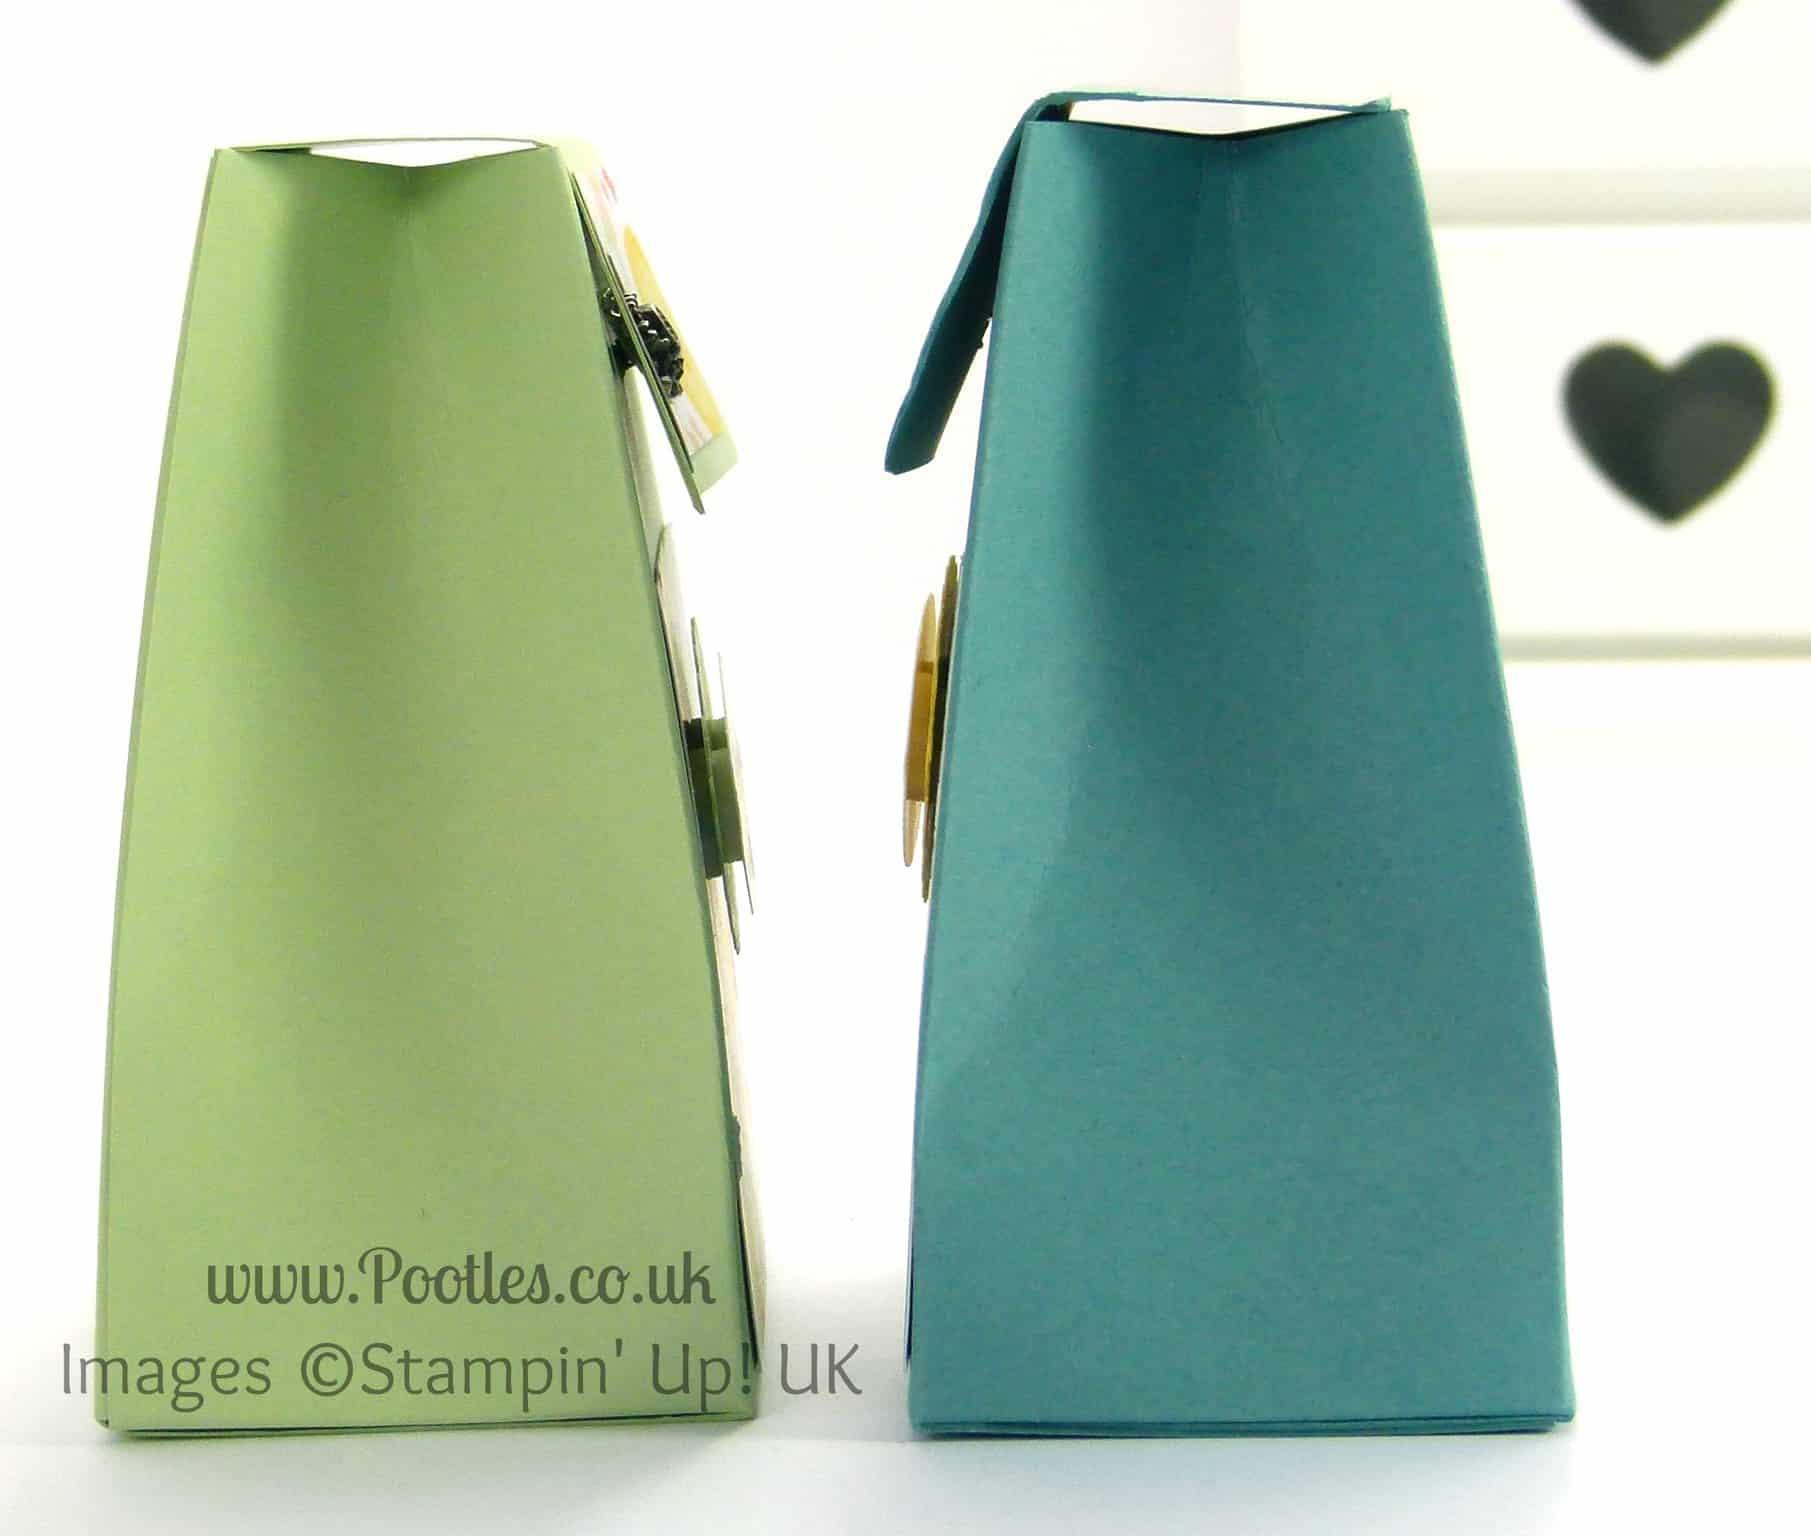 Stampin' Up! UK Demonstrator Pootles - Pinch Close Flat Topped Box Tutorial Side Profile